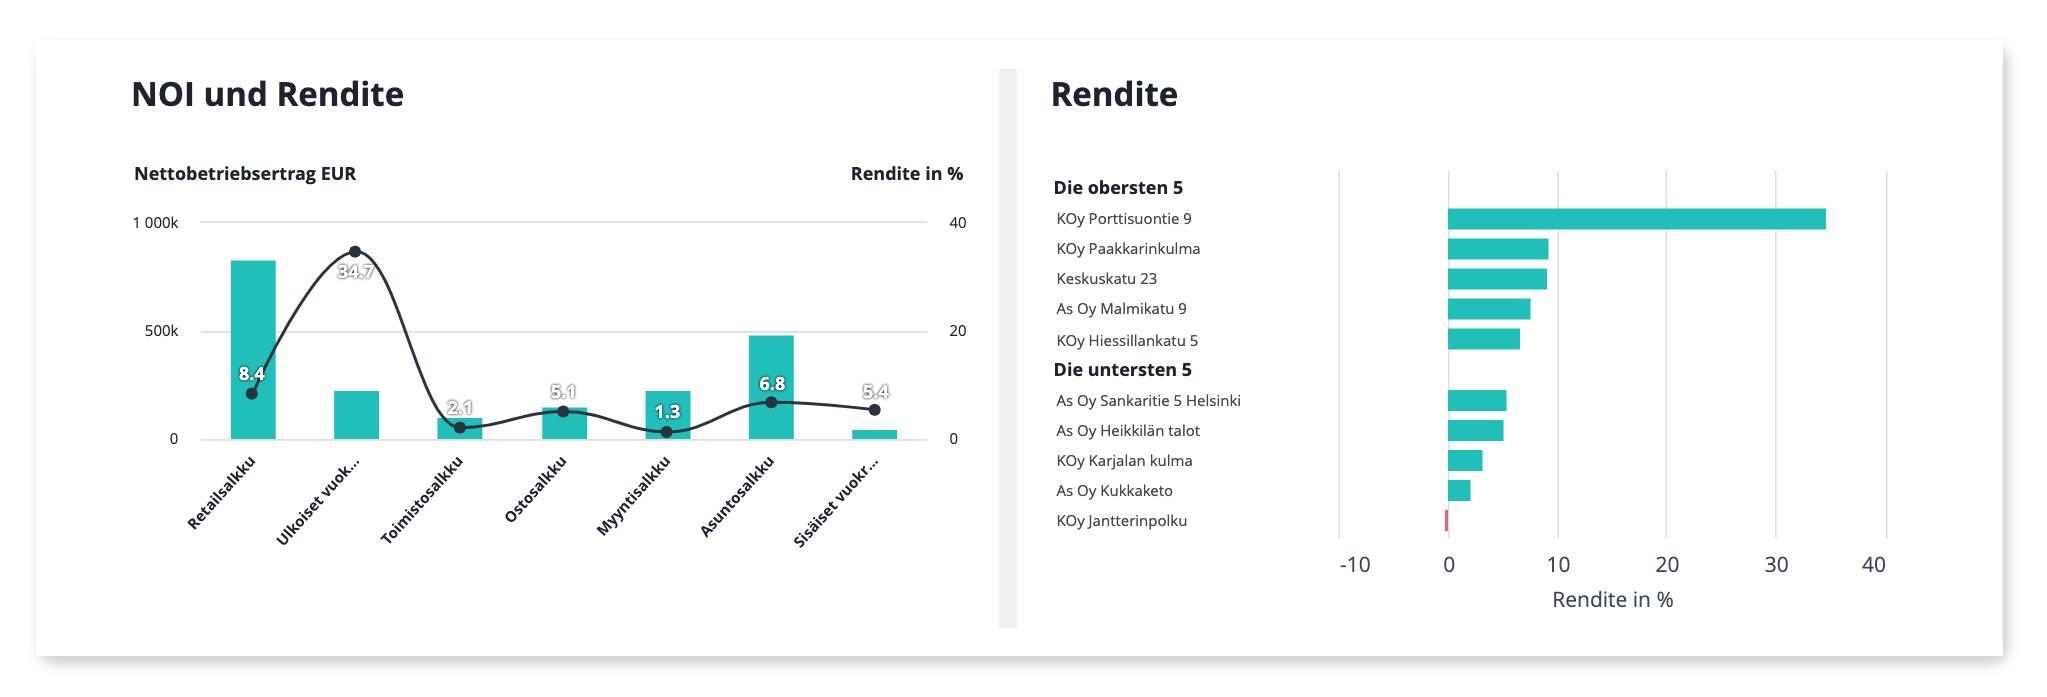 NOI Rendite KPI visualisiert